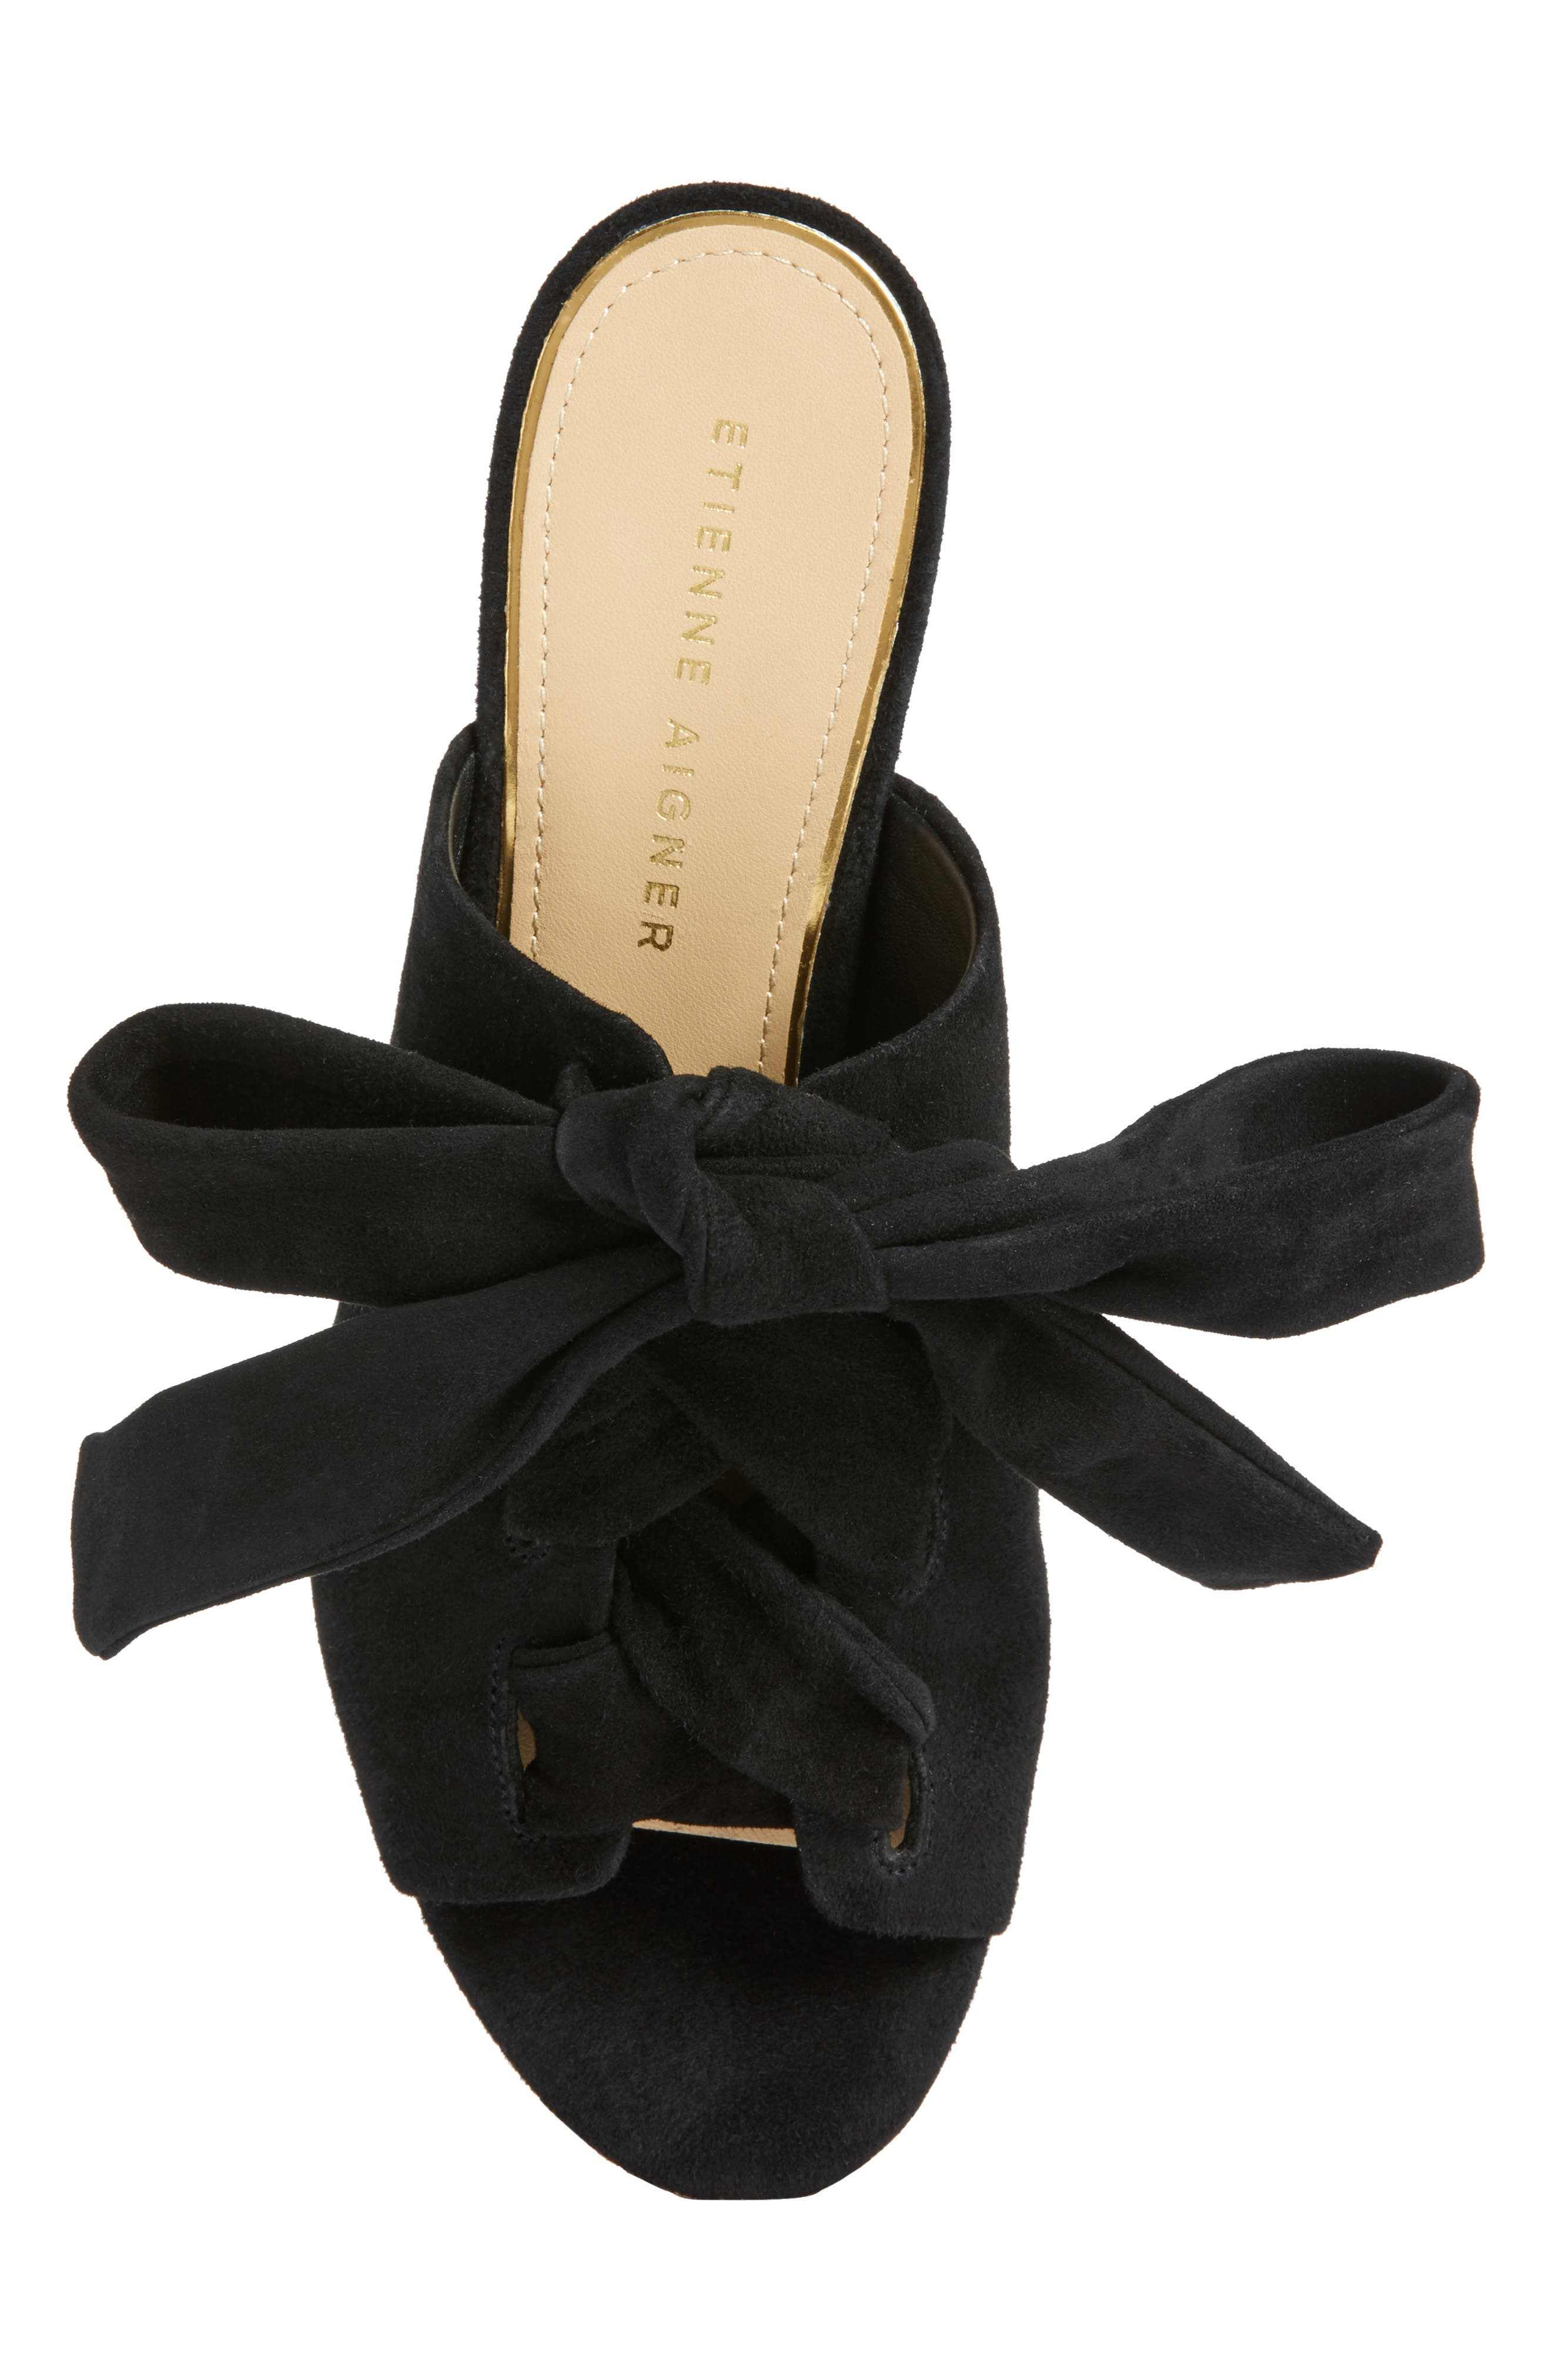 Bermuda Sandal,                             Alternate thumbnail 5, color,                             Black Suede